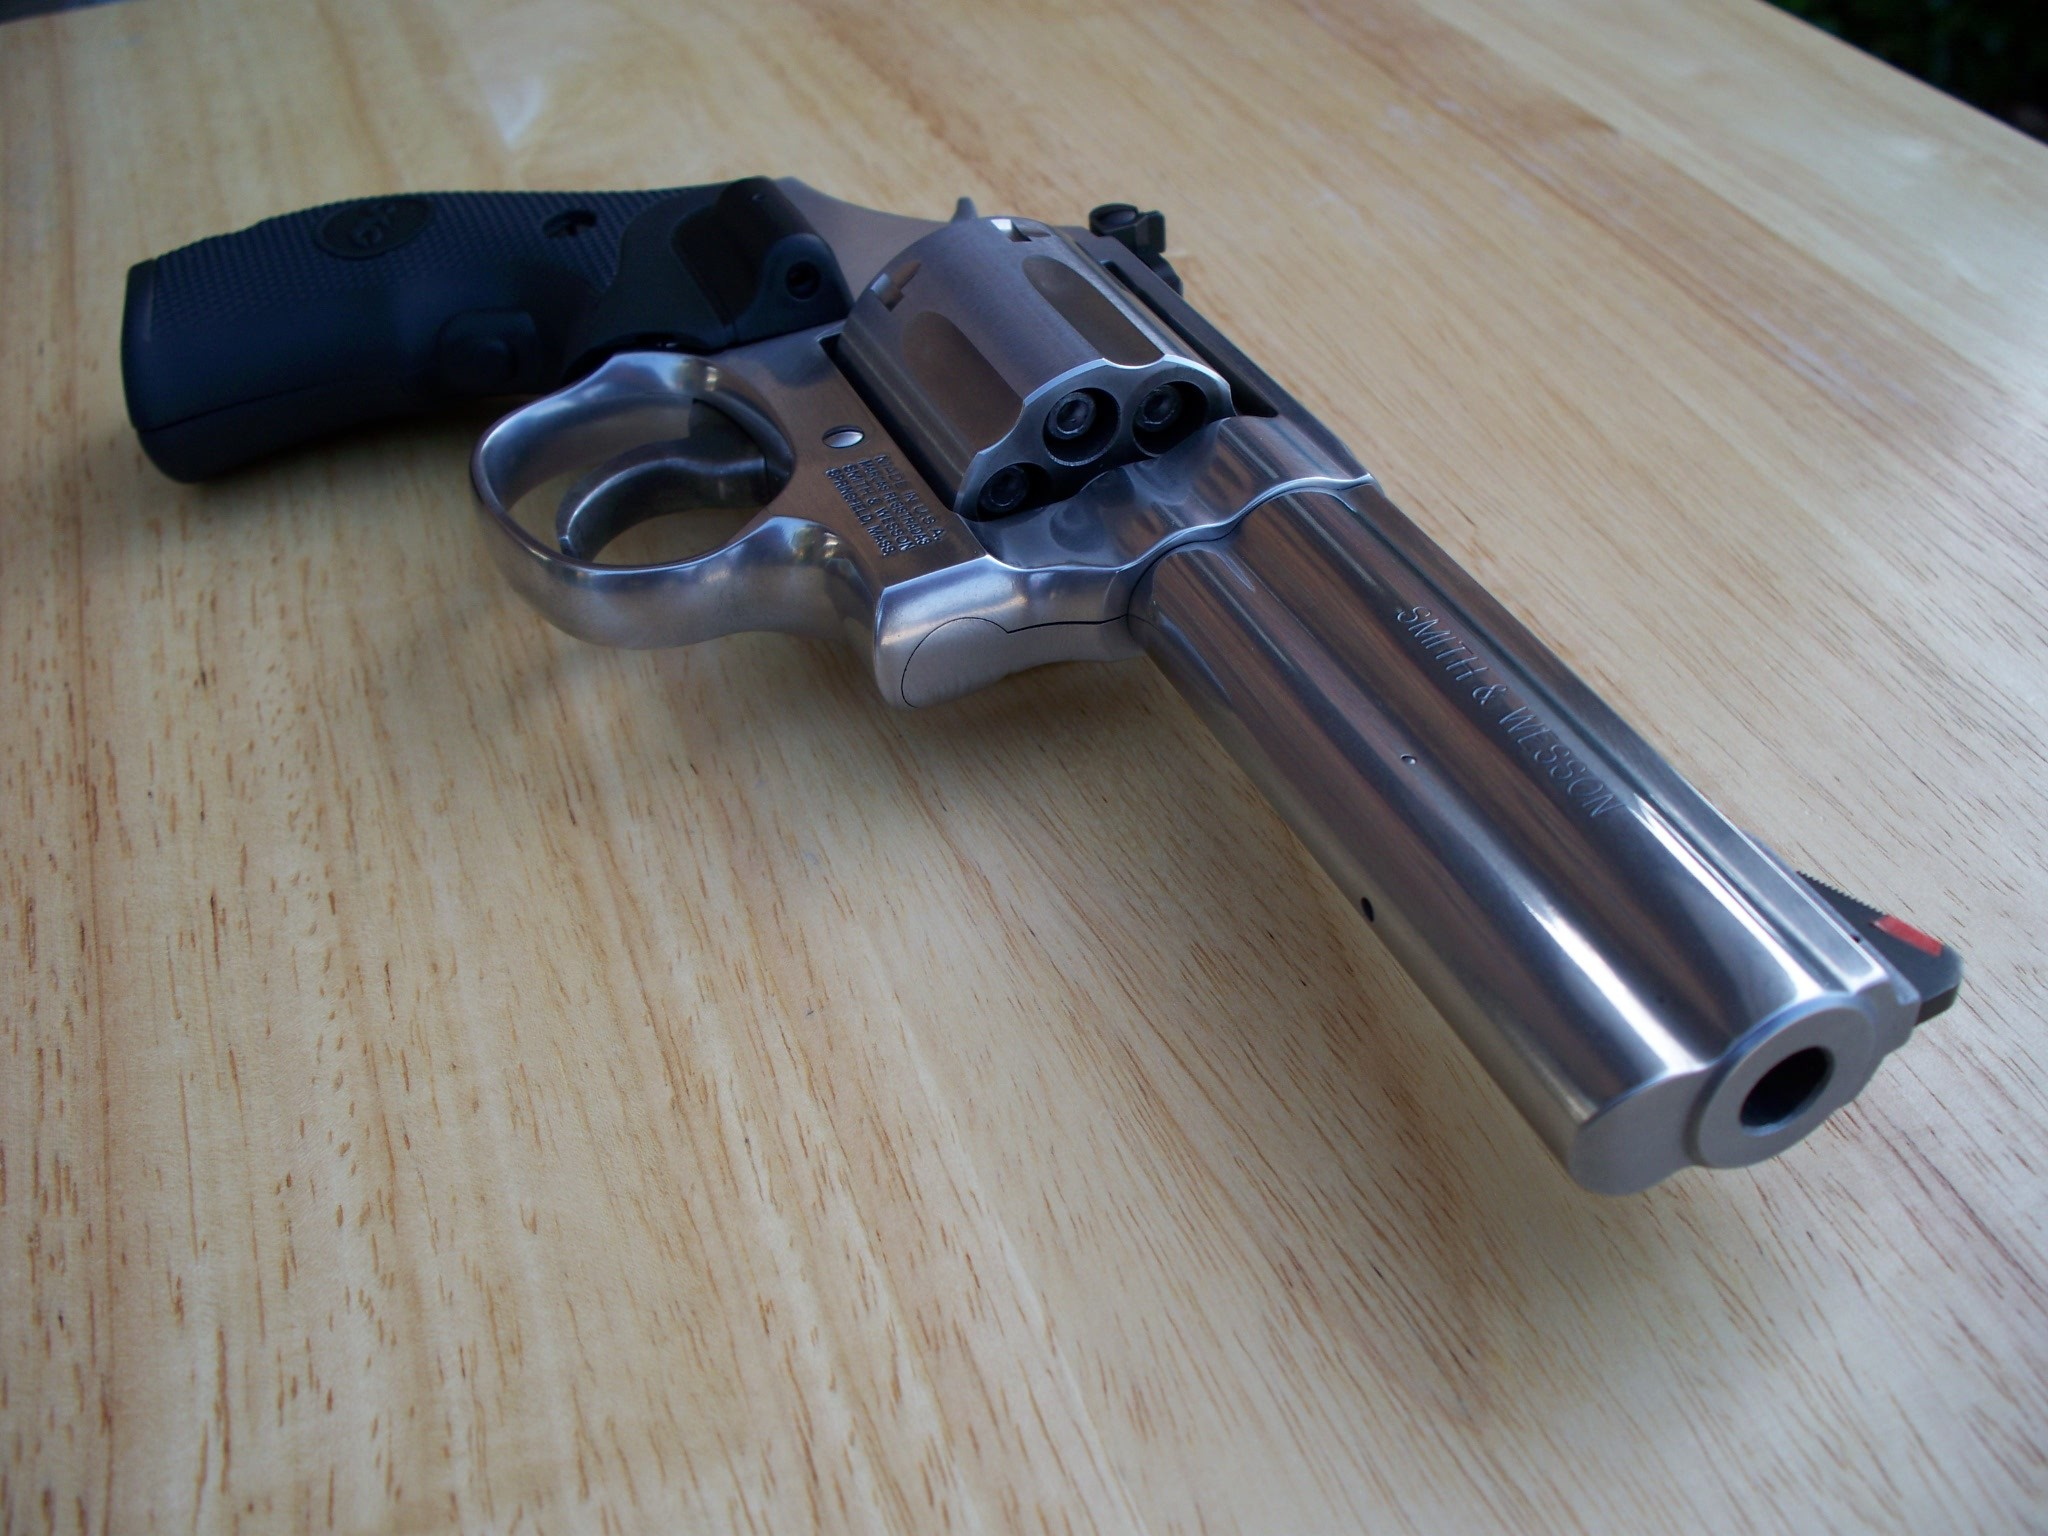 File:Smith & Wesson .357 Model 686 Plus barrel view.jpg